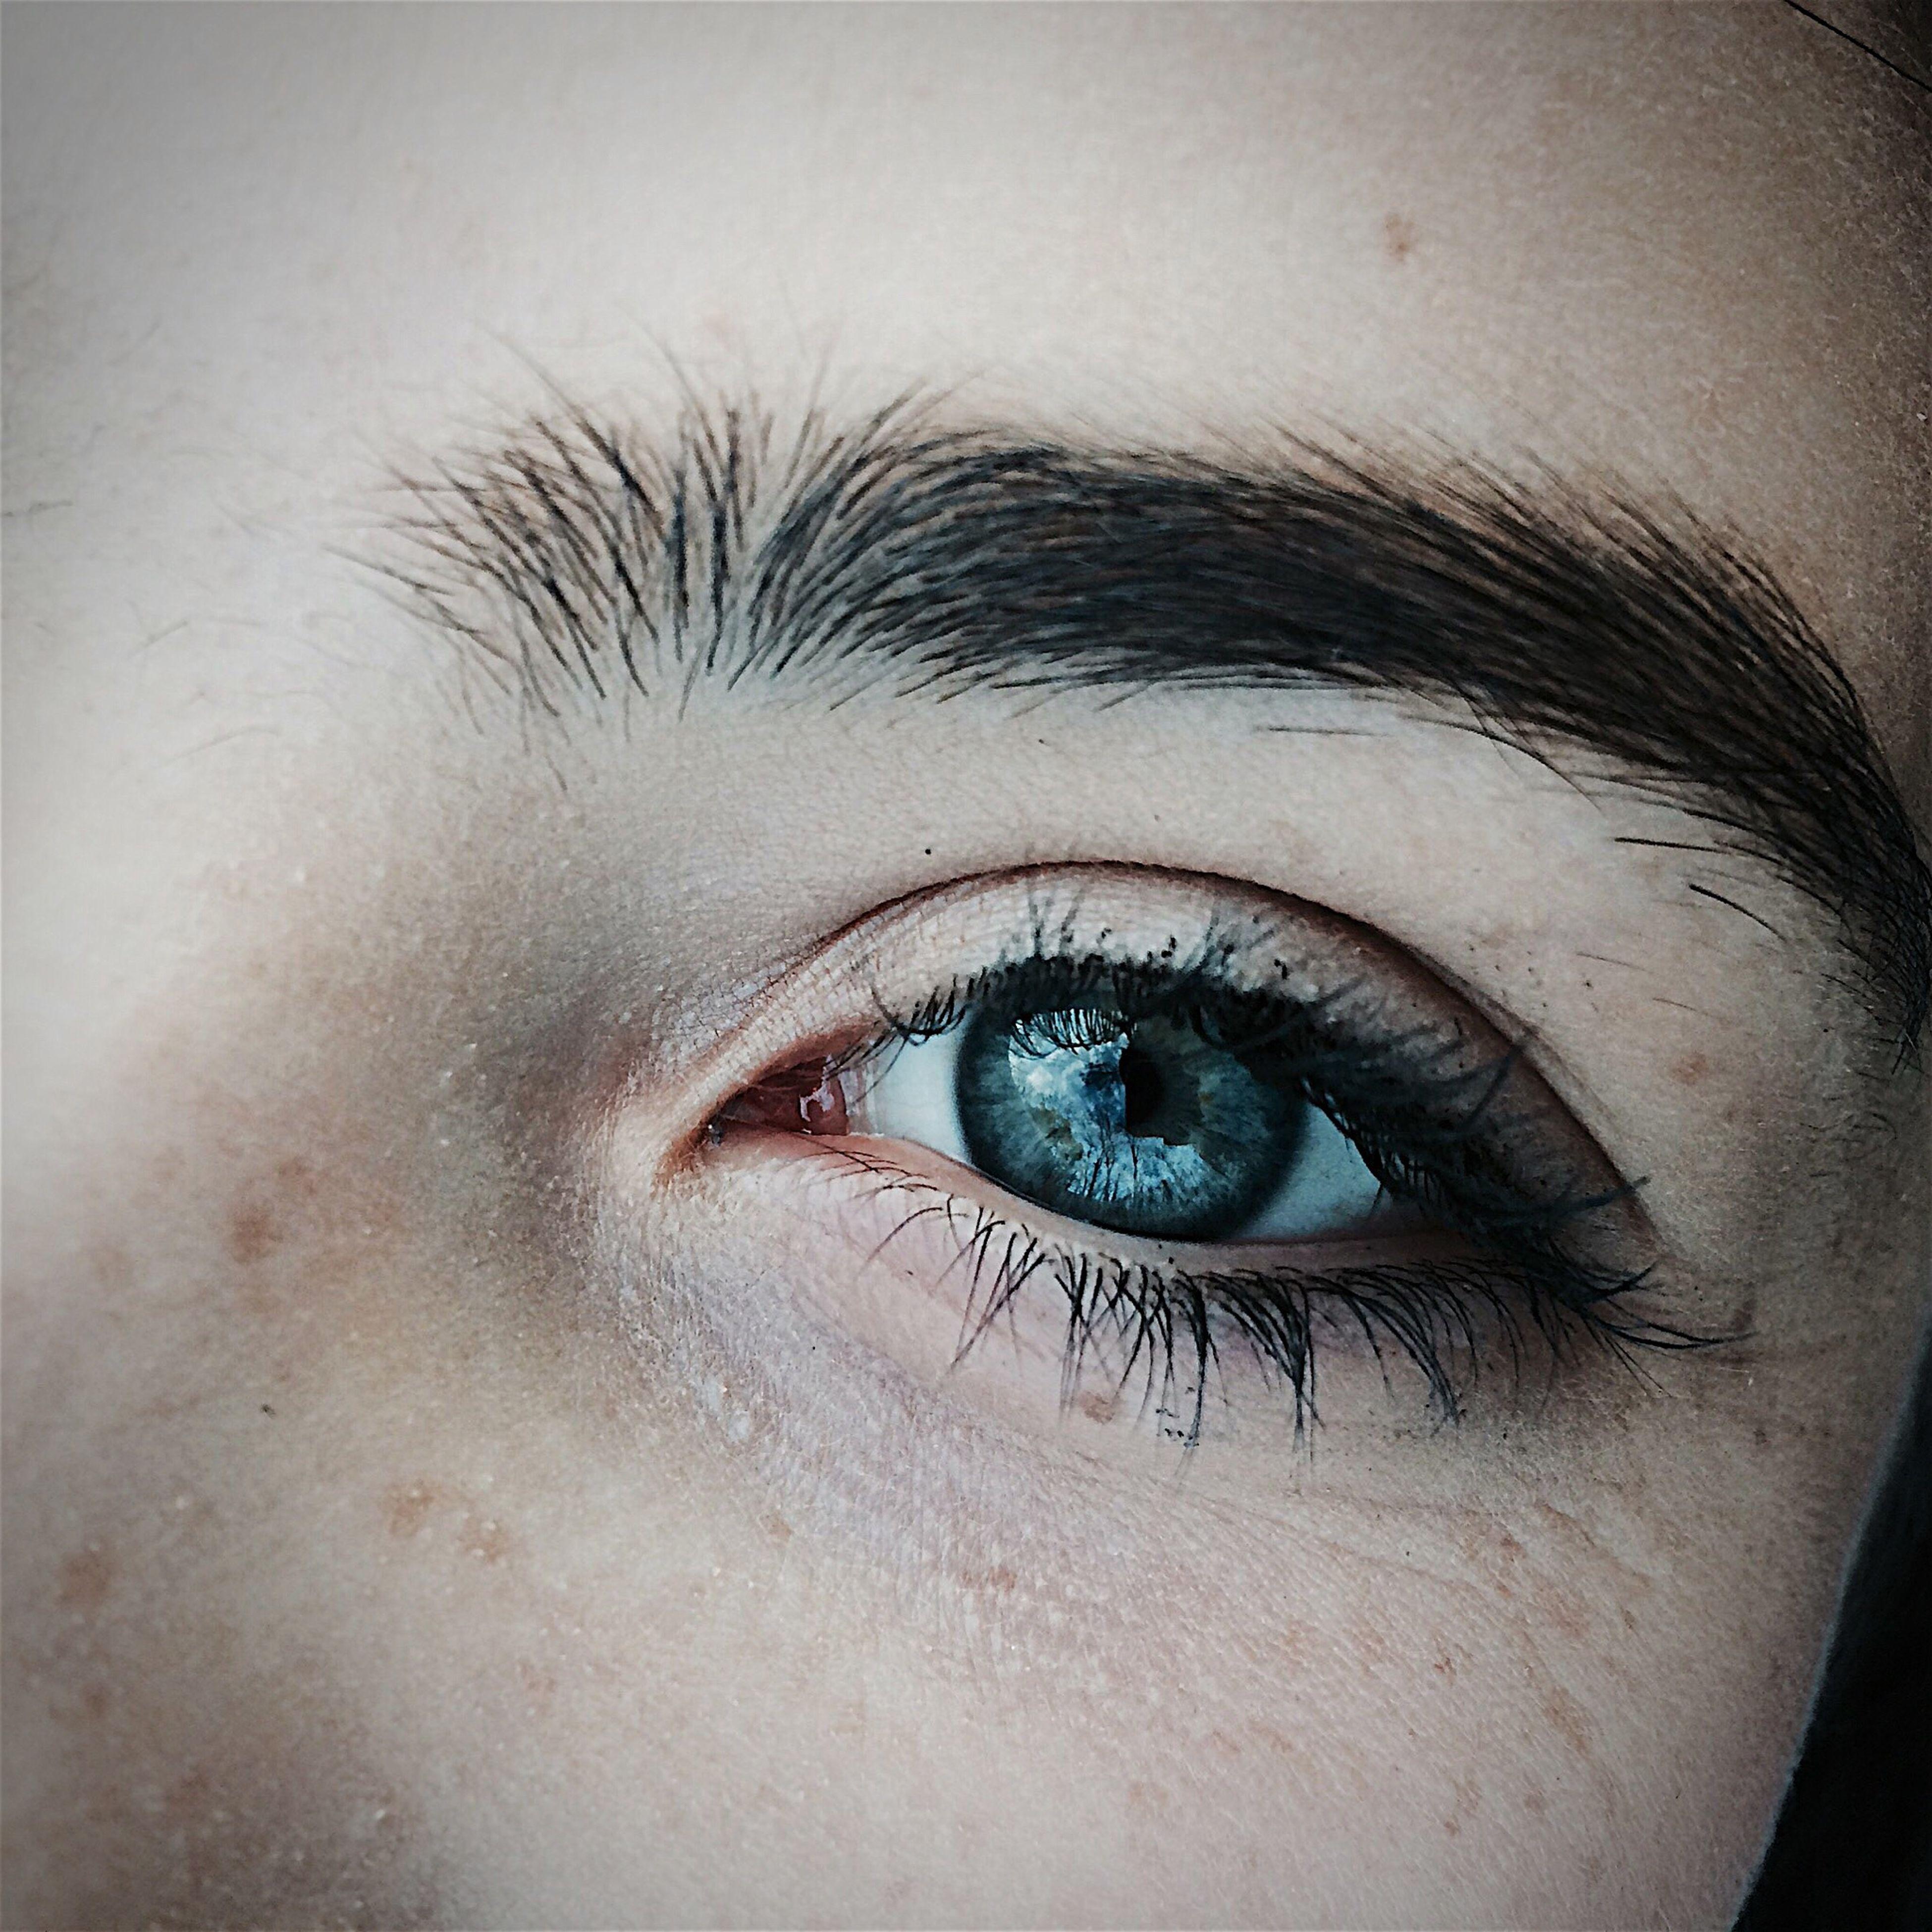 human eye, eyelash, close-up, human body part, eyebrow, eyesight, one person, human skin, eyeball, young adult, people, adult, day